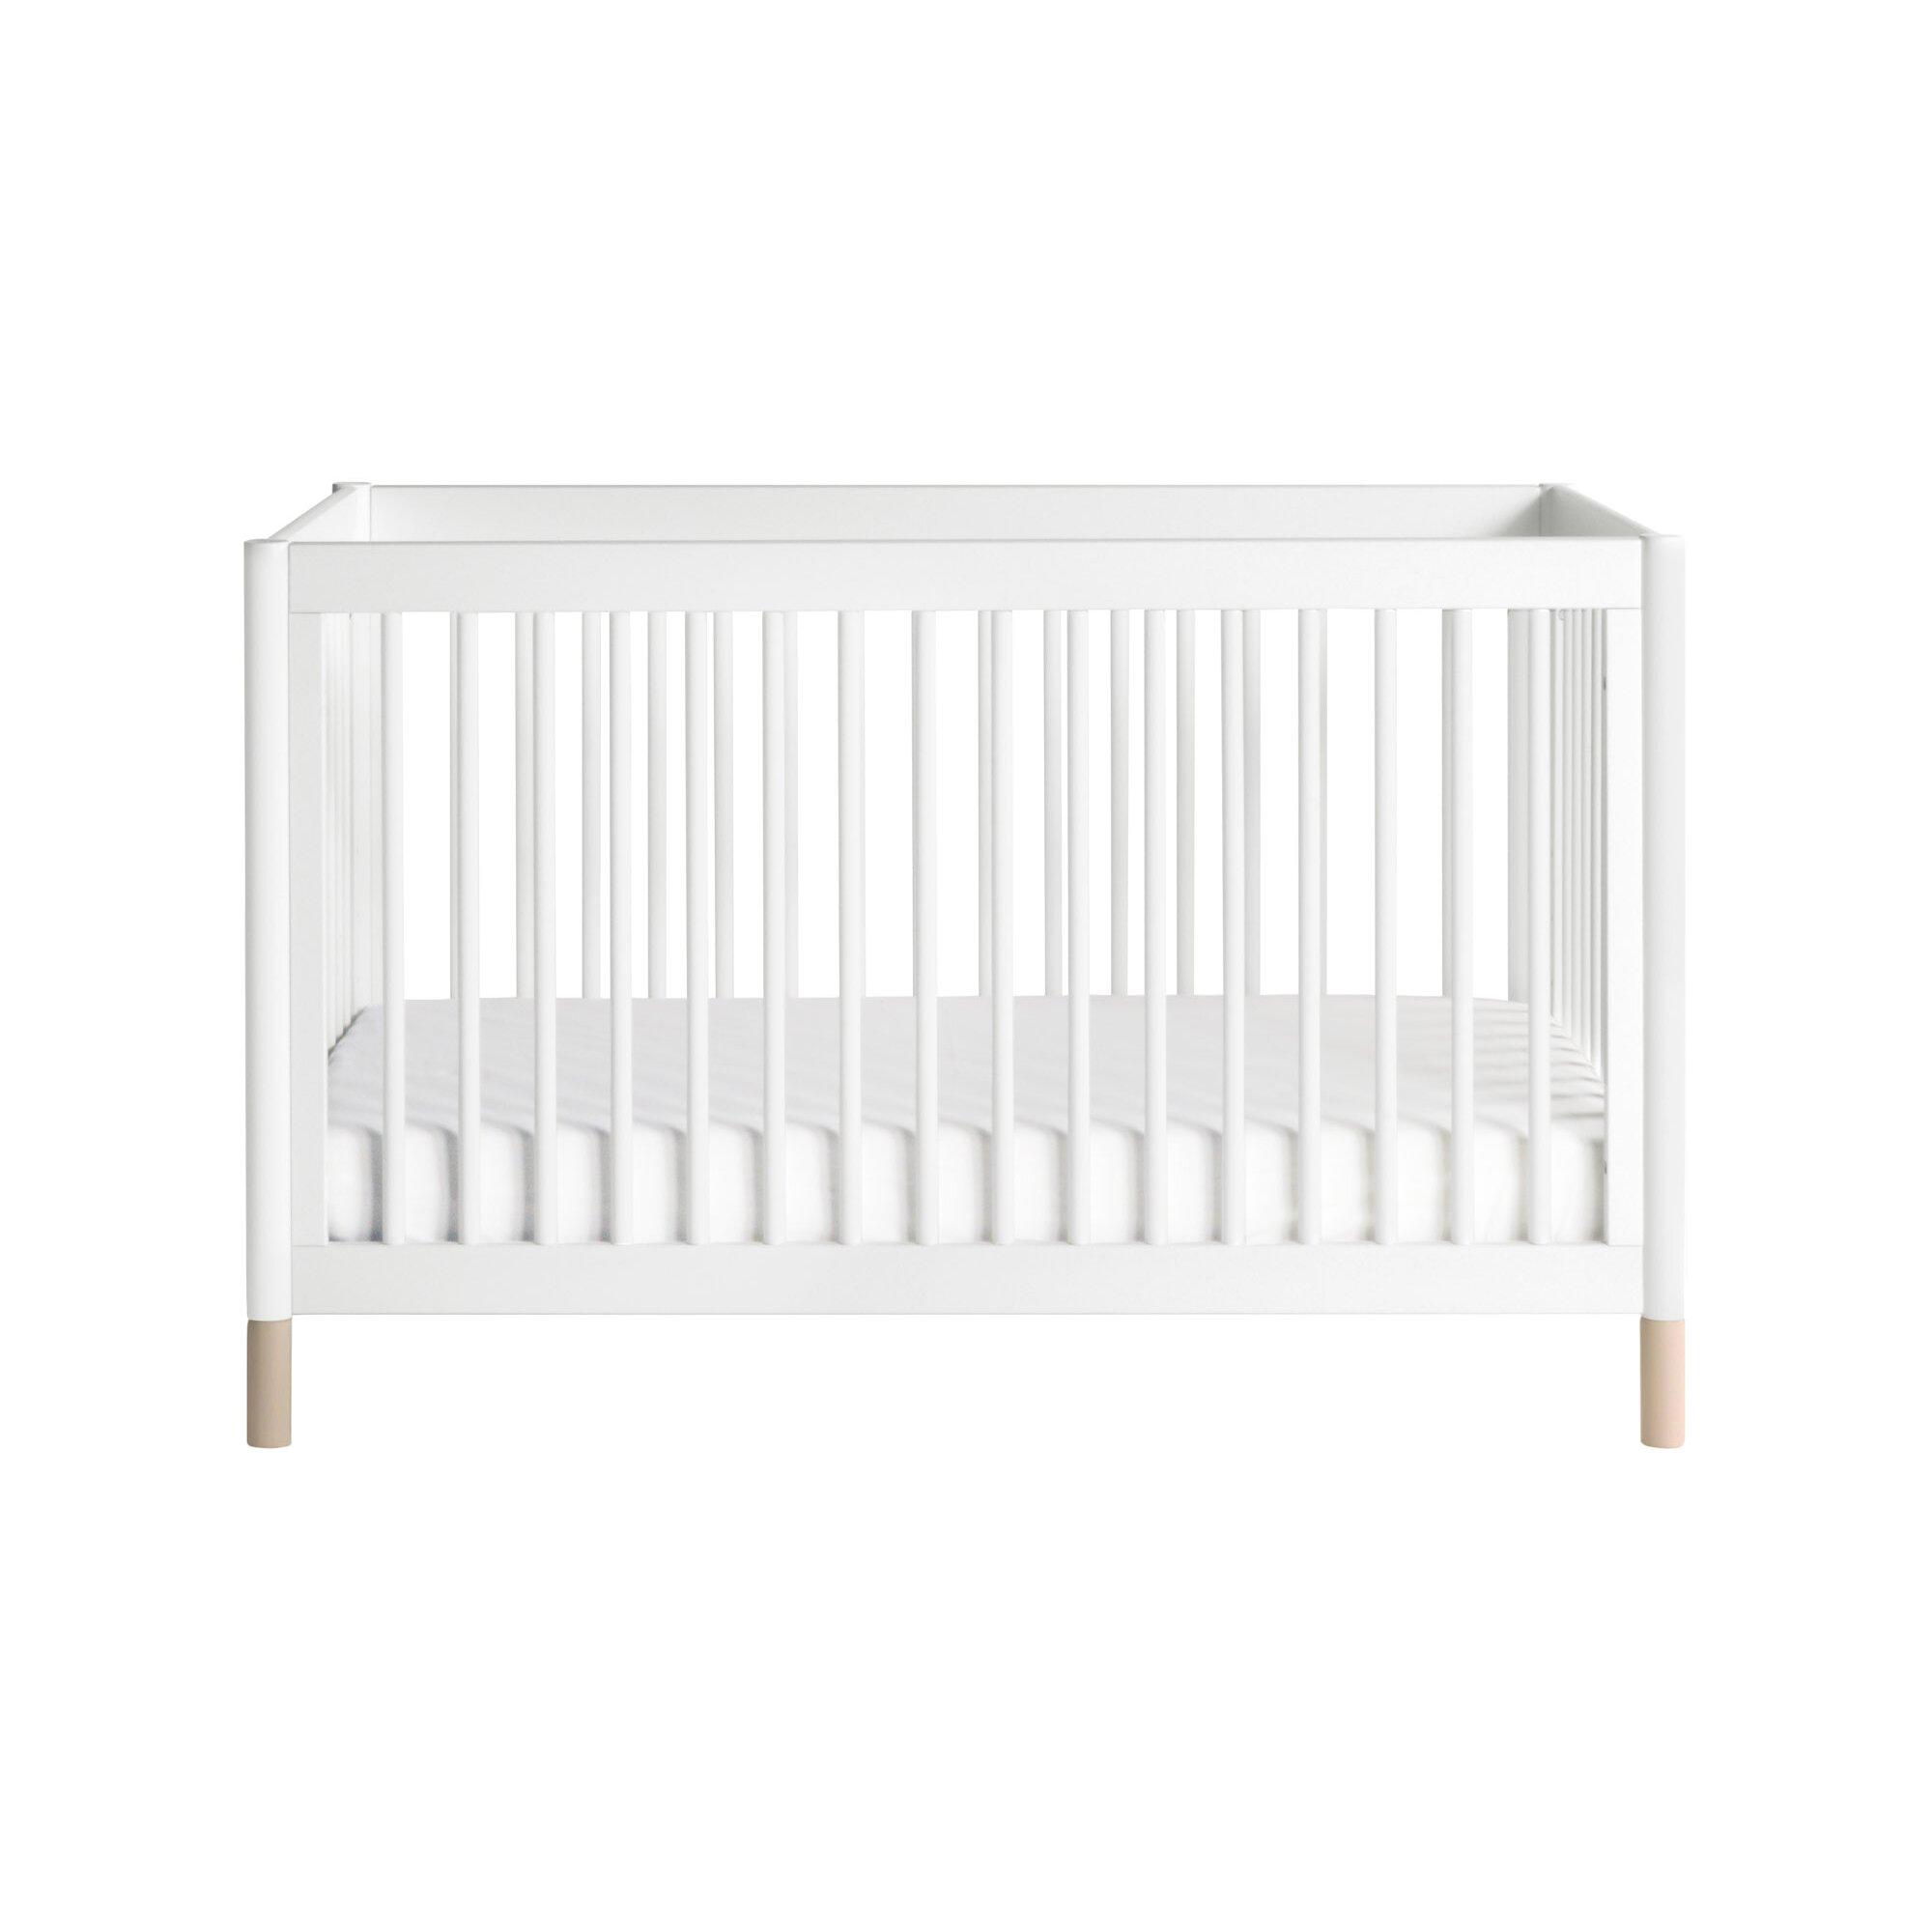 Baby cribs lubbock tx - Babyletto Gelato 4 In 1 Convertible Crib